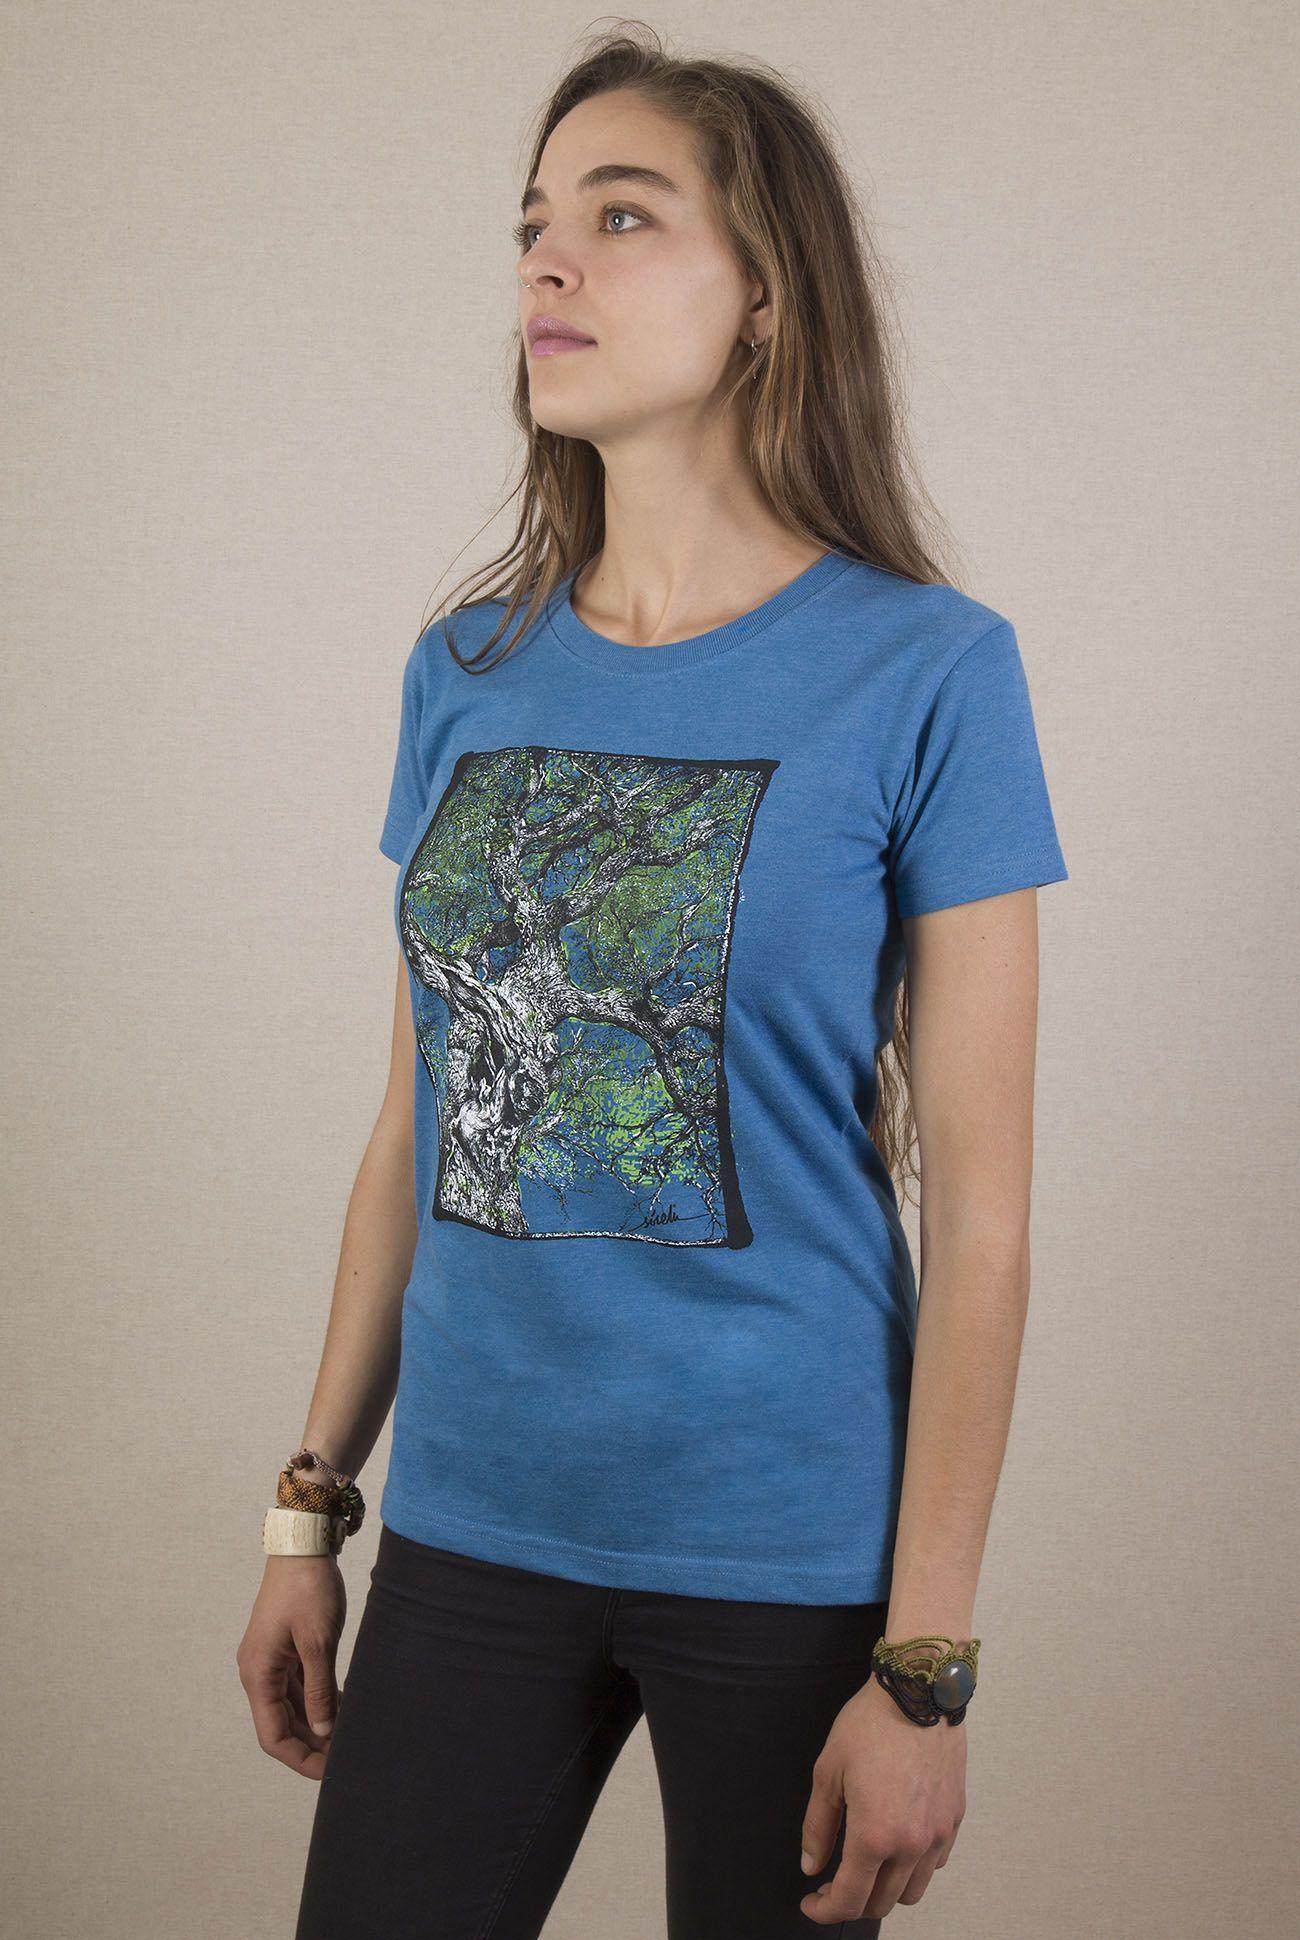 Camiseta arbol Mujer